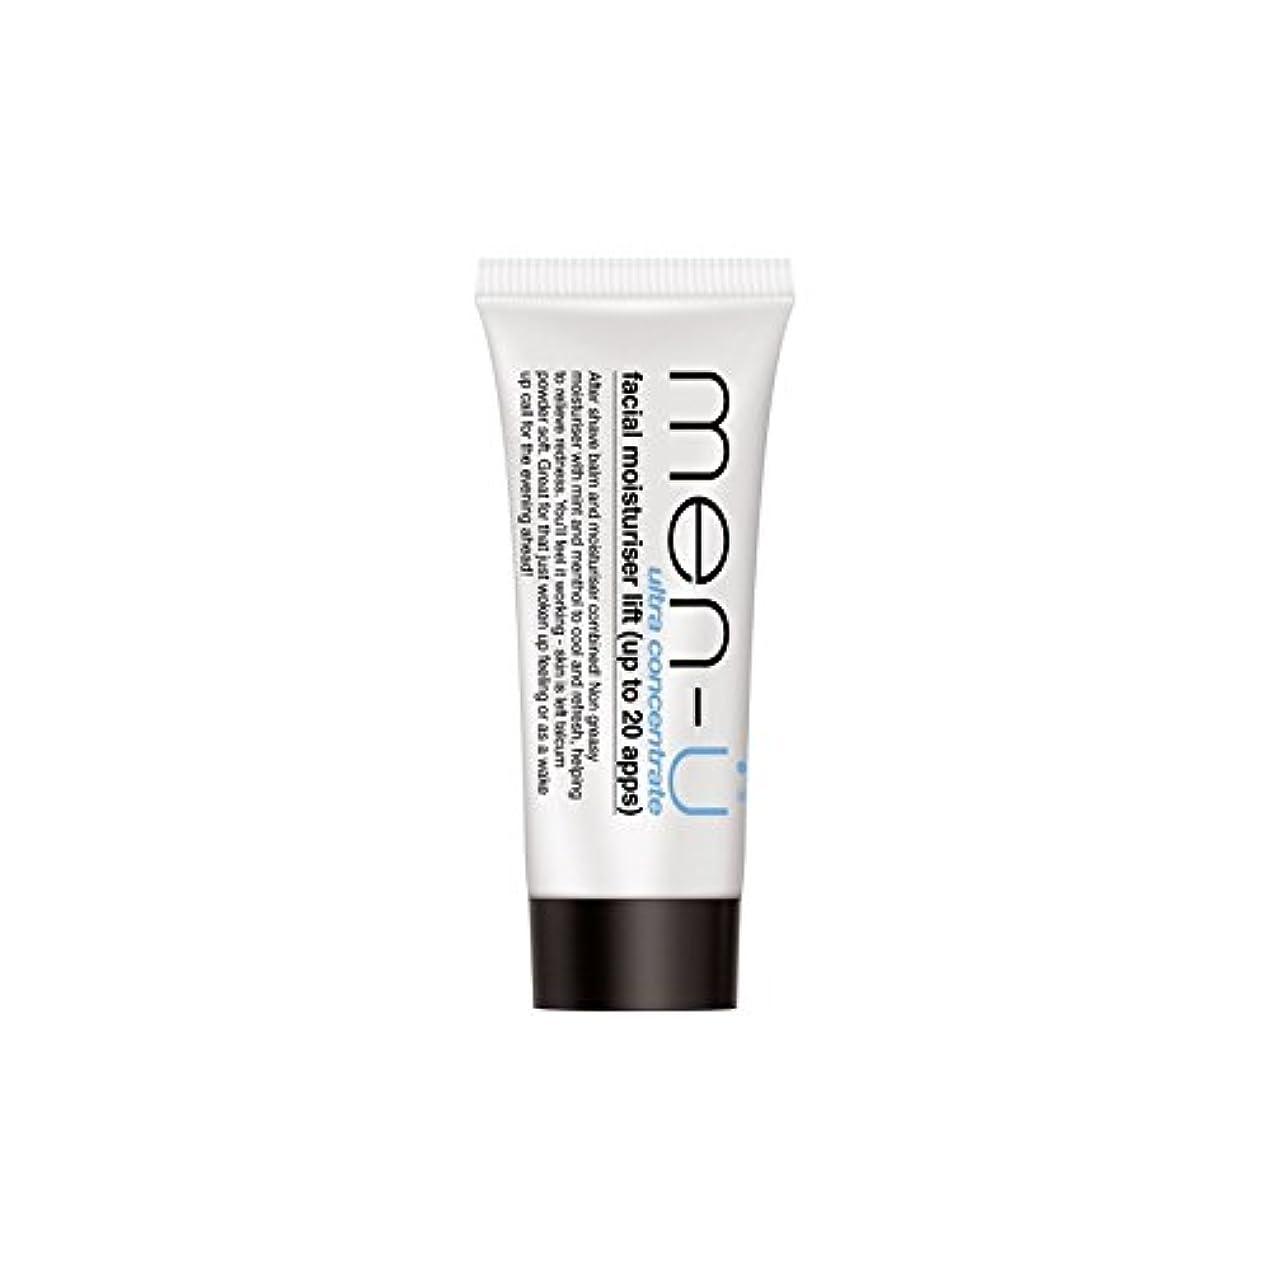 Men-? Buddy Facial Moisturiser Lift Tube (15ml) - 男性-のバディ顔の保湿剤のリフトチューブ(15ミリリットル) [並行輸入品]